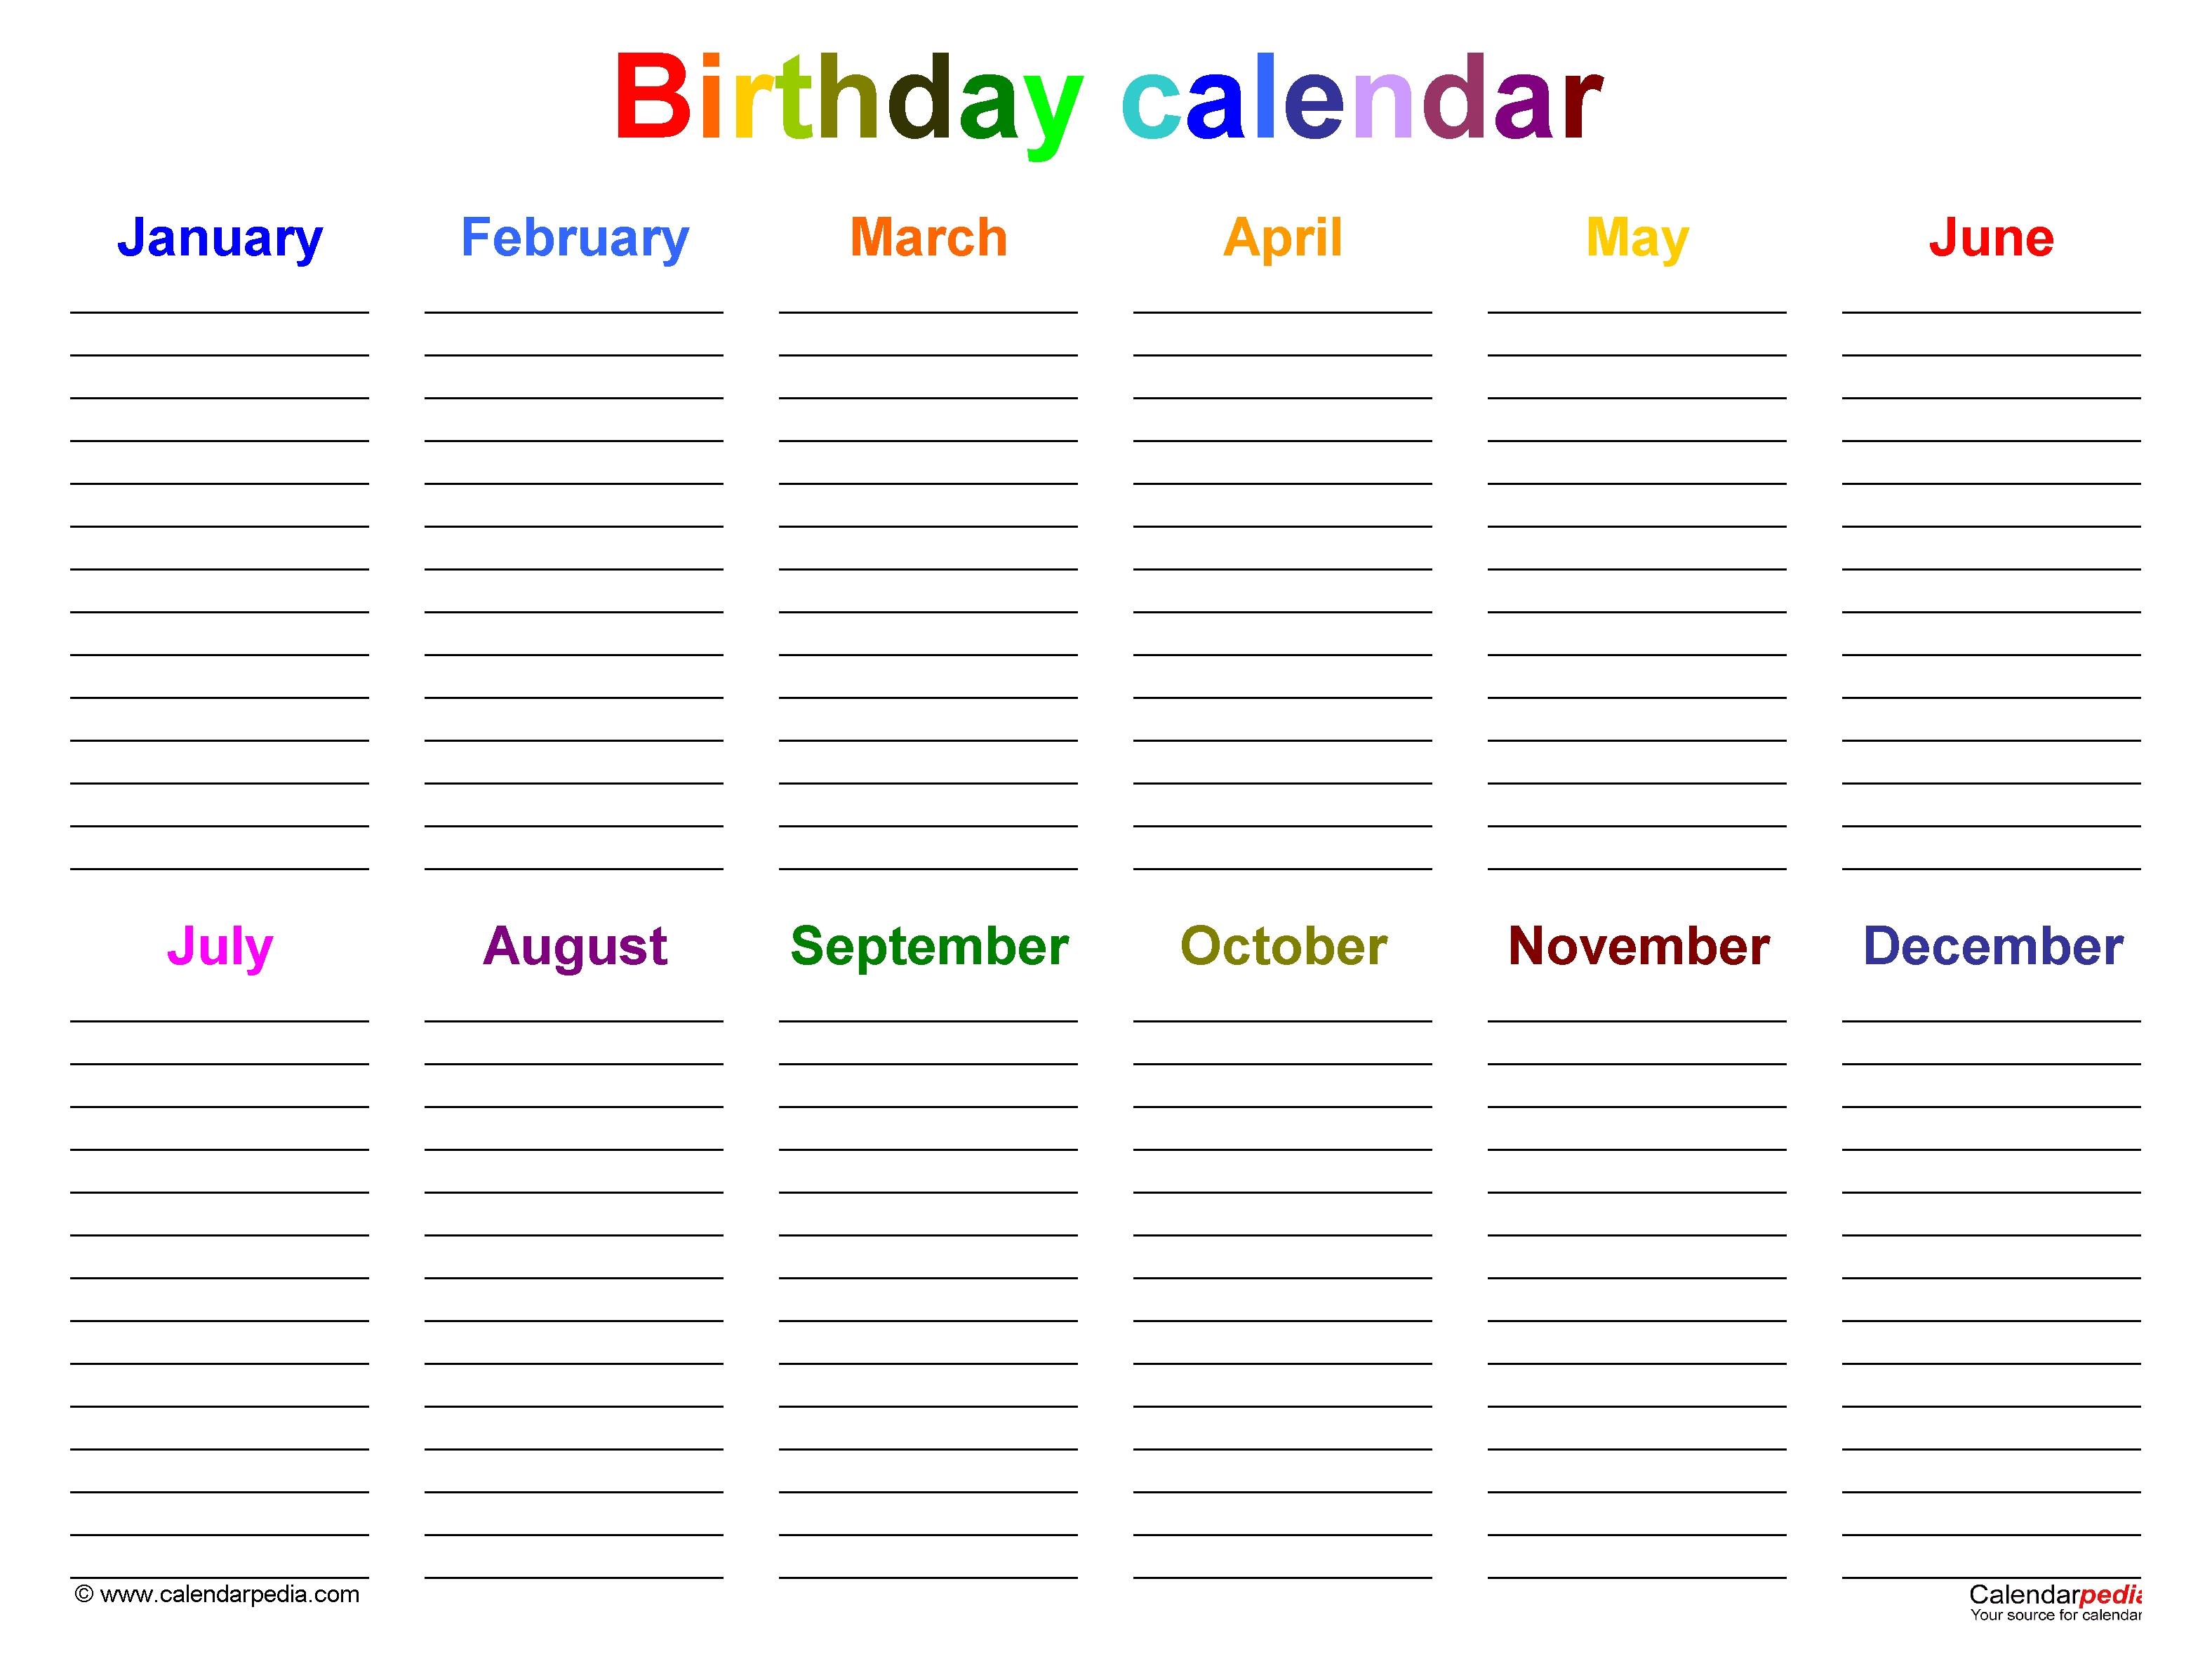 Birthday Calendars - Free Printable Microsoft Excel Templates